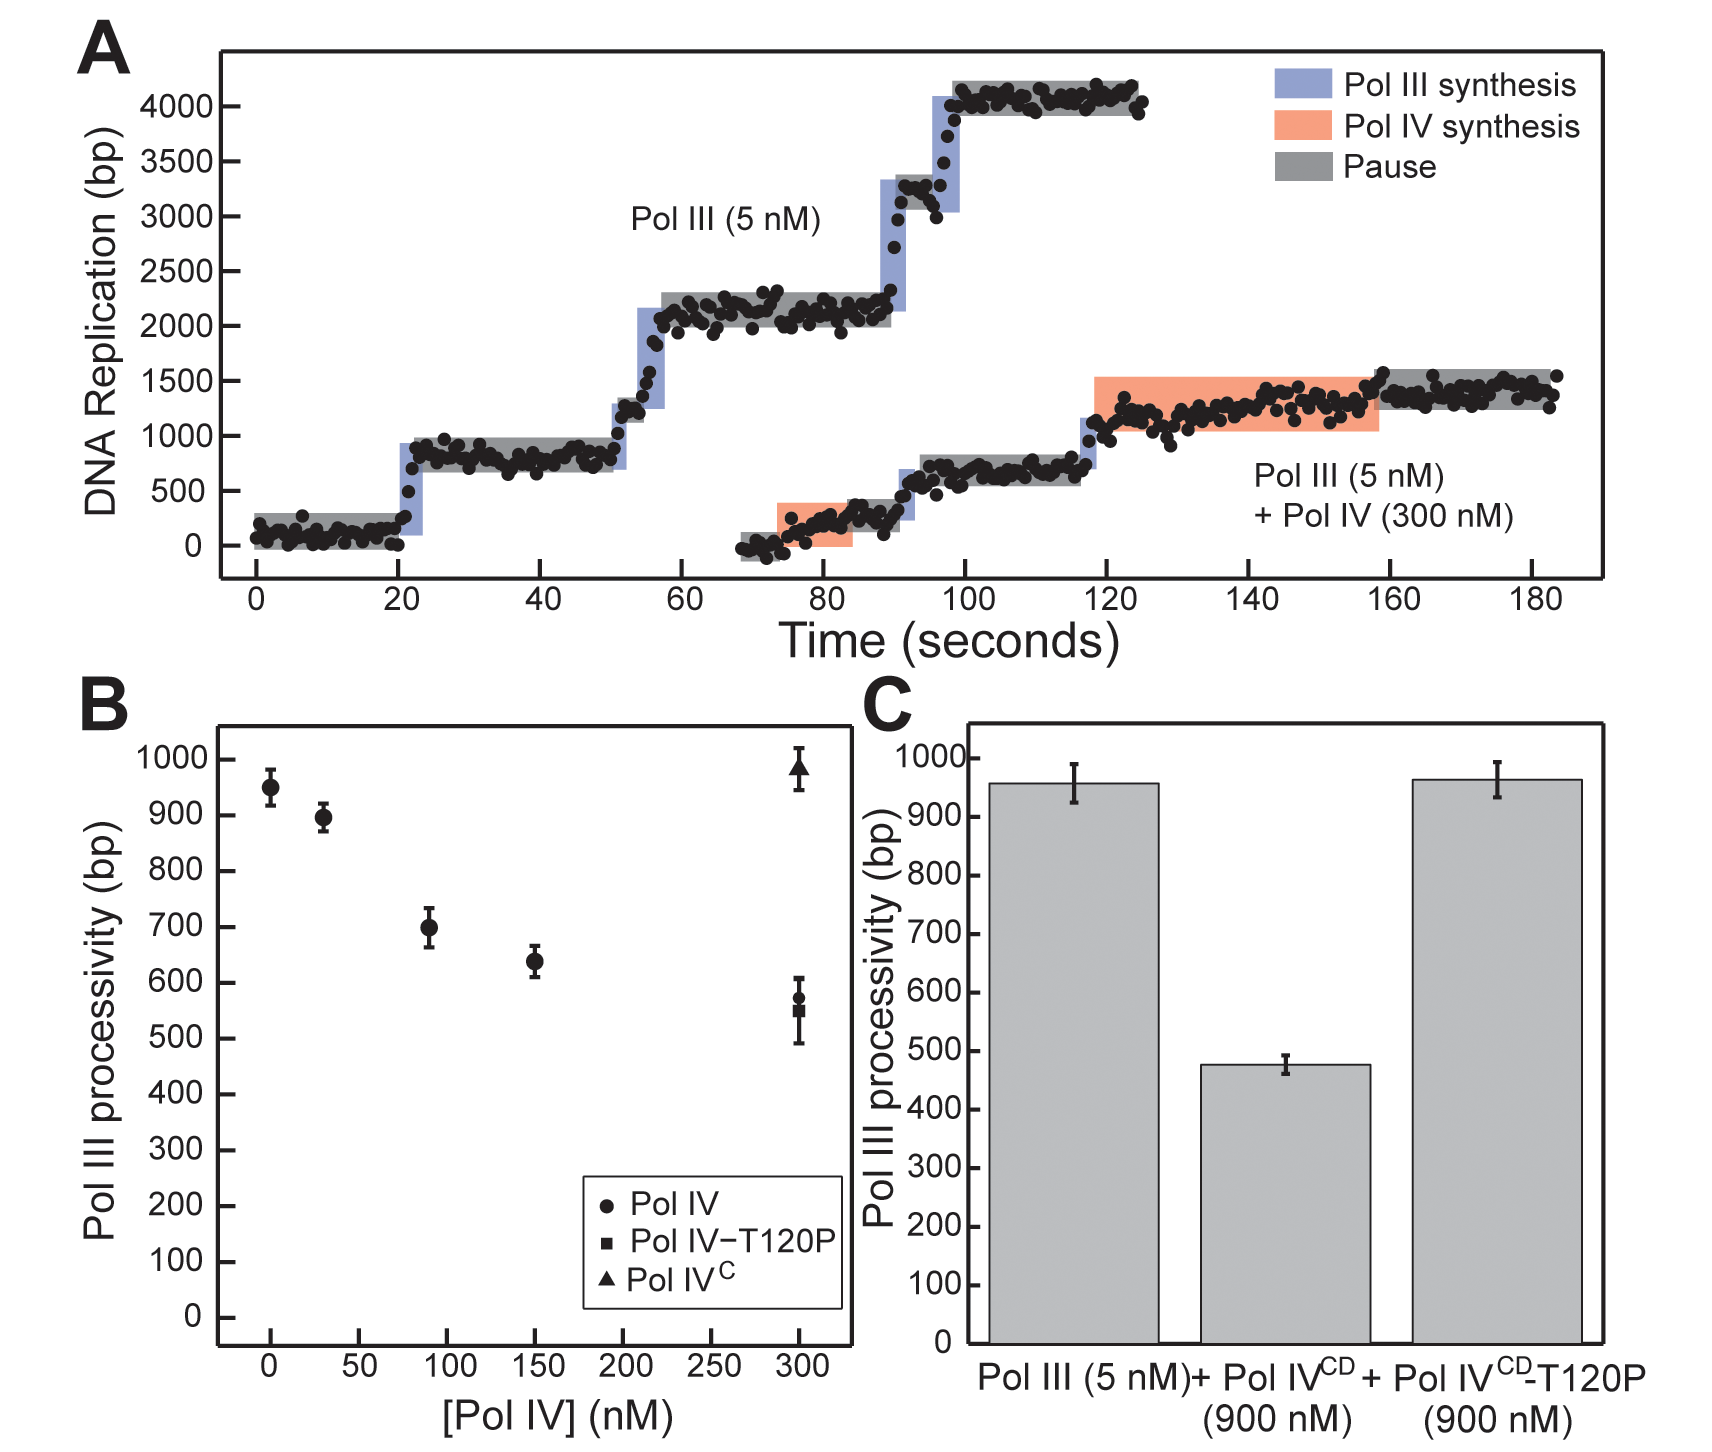 Pol IV<sup>CD</sup>-T120P, but not full length Pol IV-T120P, fails to inhibit Pol III processivity <i>in vitro</i>.